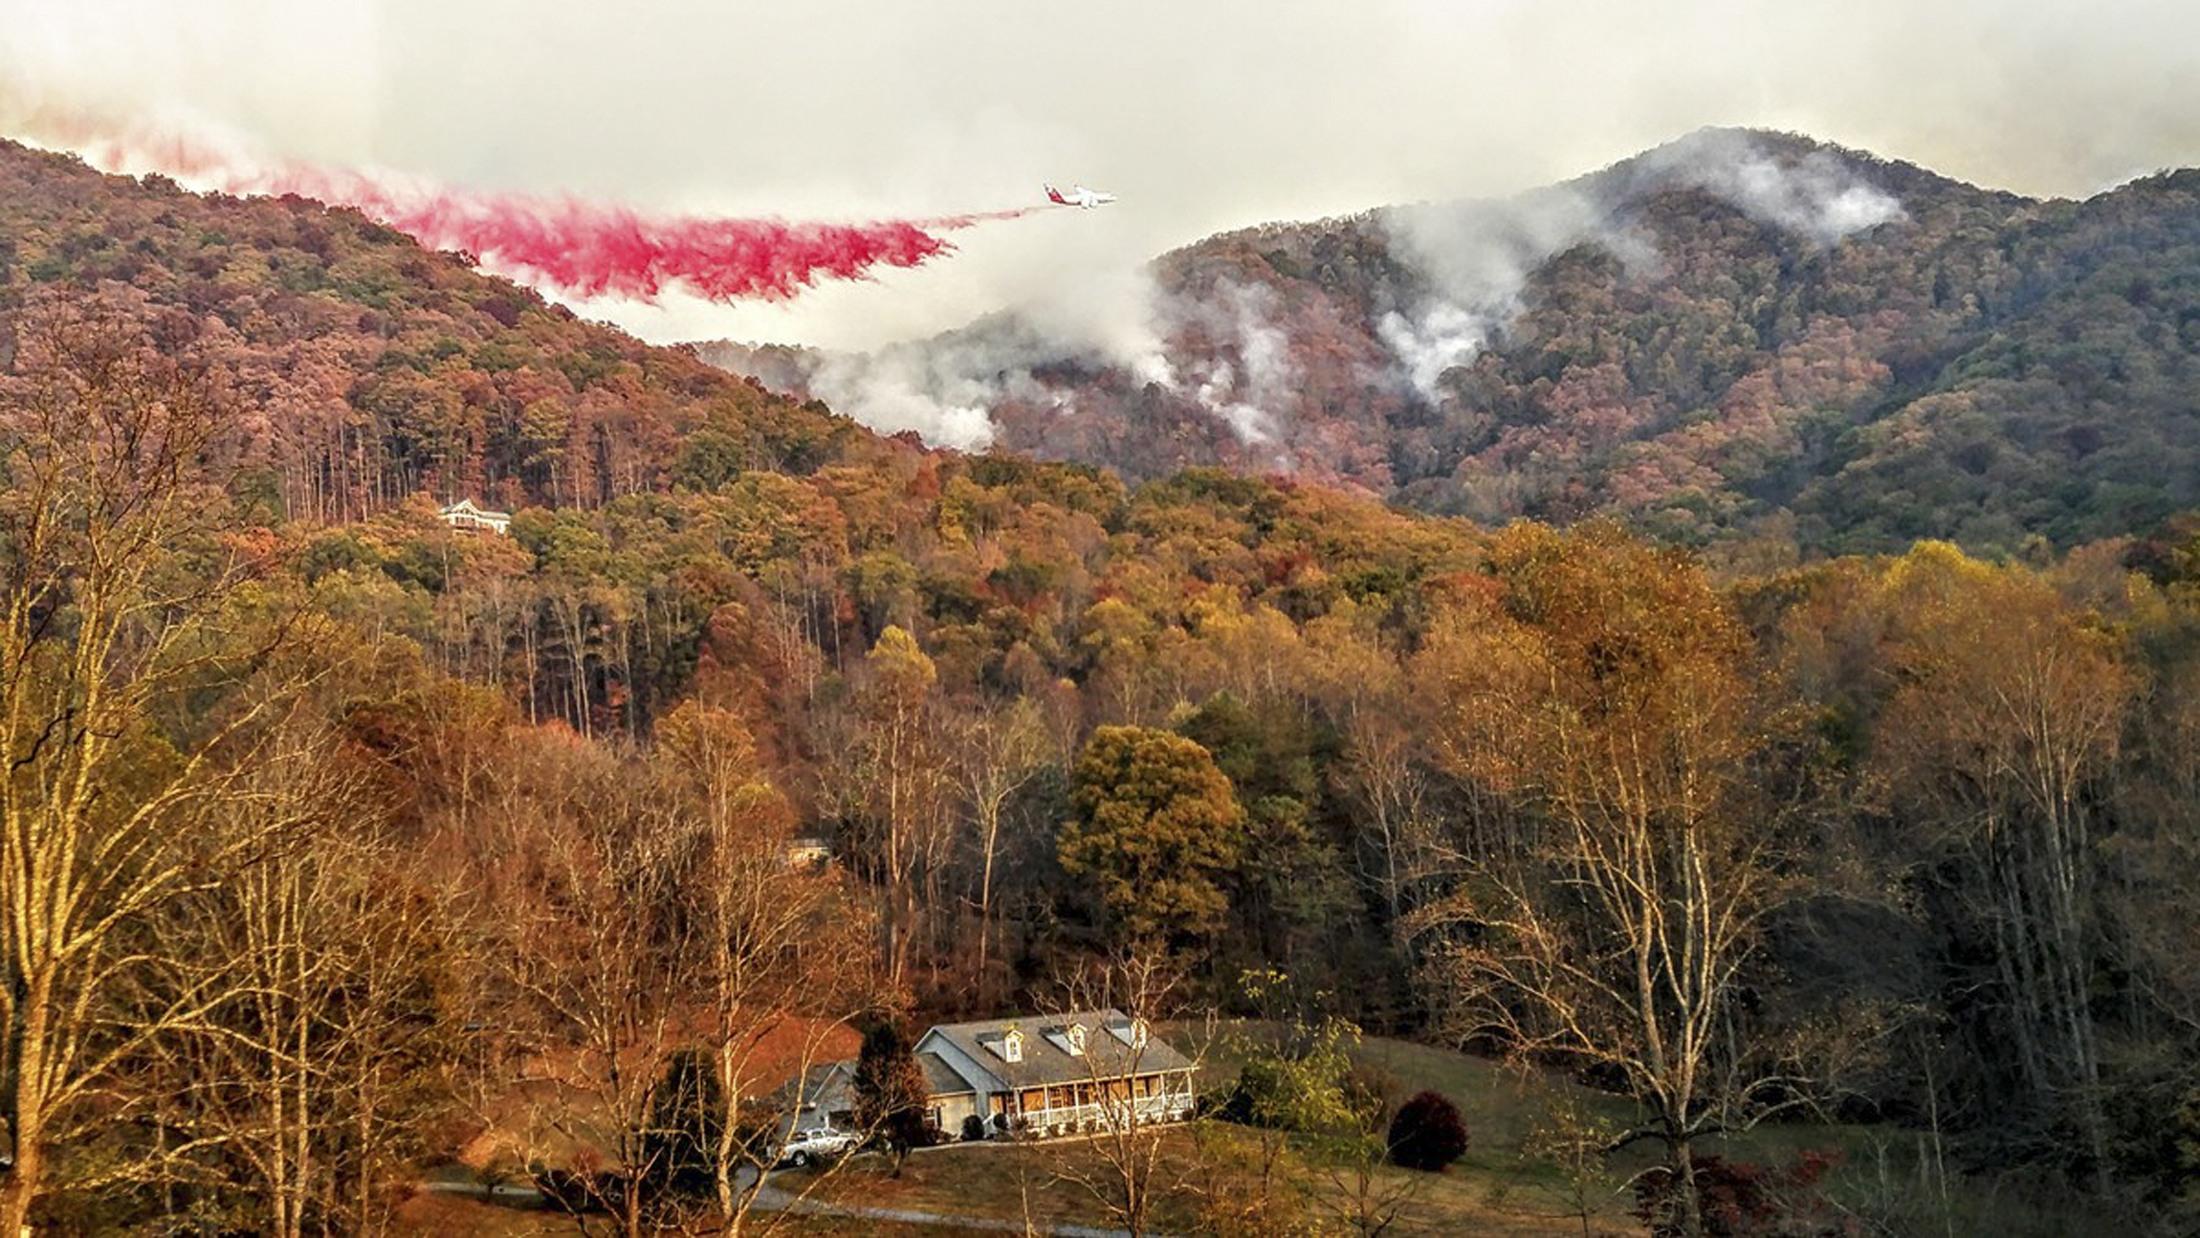 A heavy air tanker drops fire retardant over the Boteler wildfire near Hayesville, North Carolina, U.S.